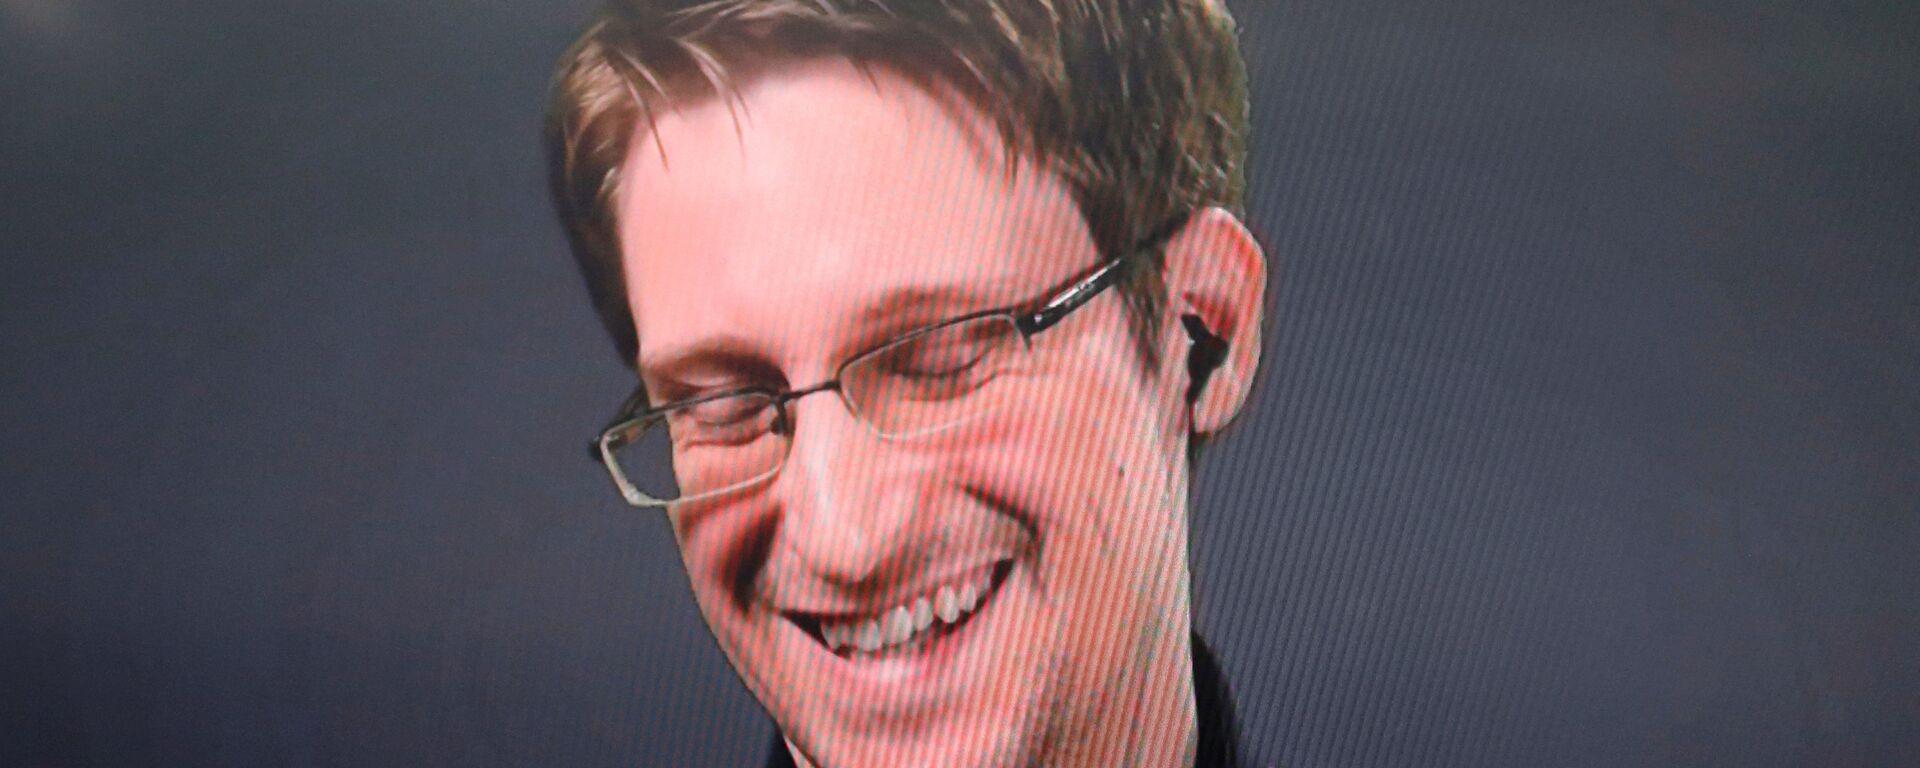 Edward Snowden speaks via video link during a news conference in New York City, U.S. September 14, 2016. - Sputnik Mundo, 1920, 04.10.2021